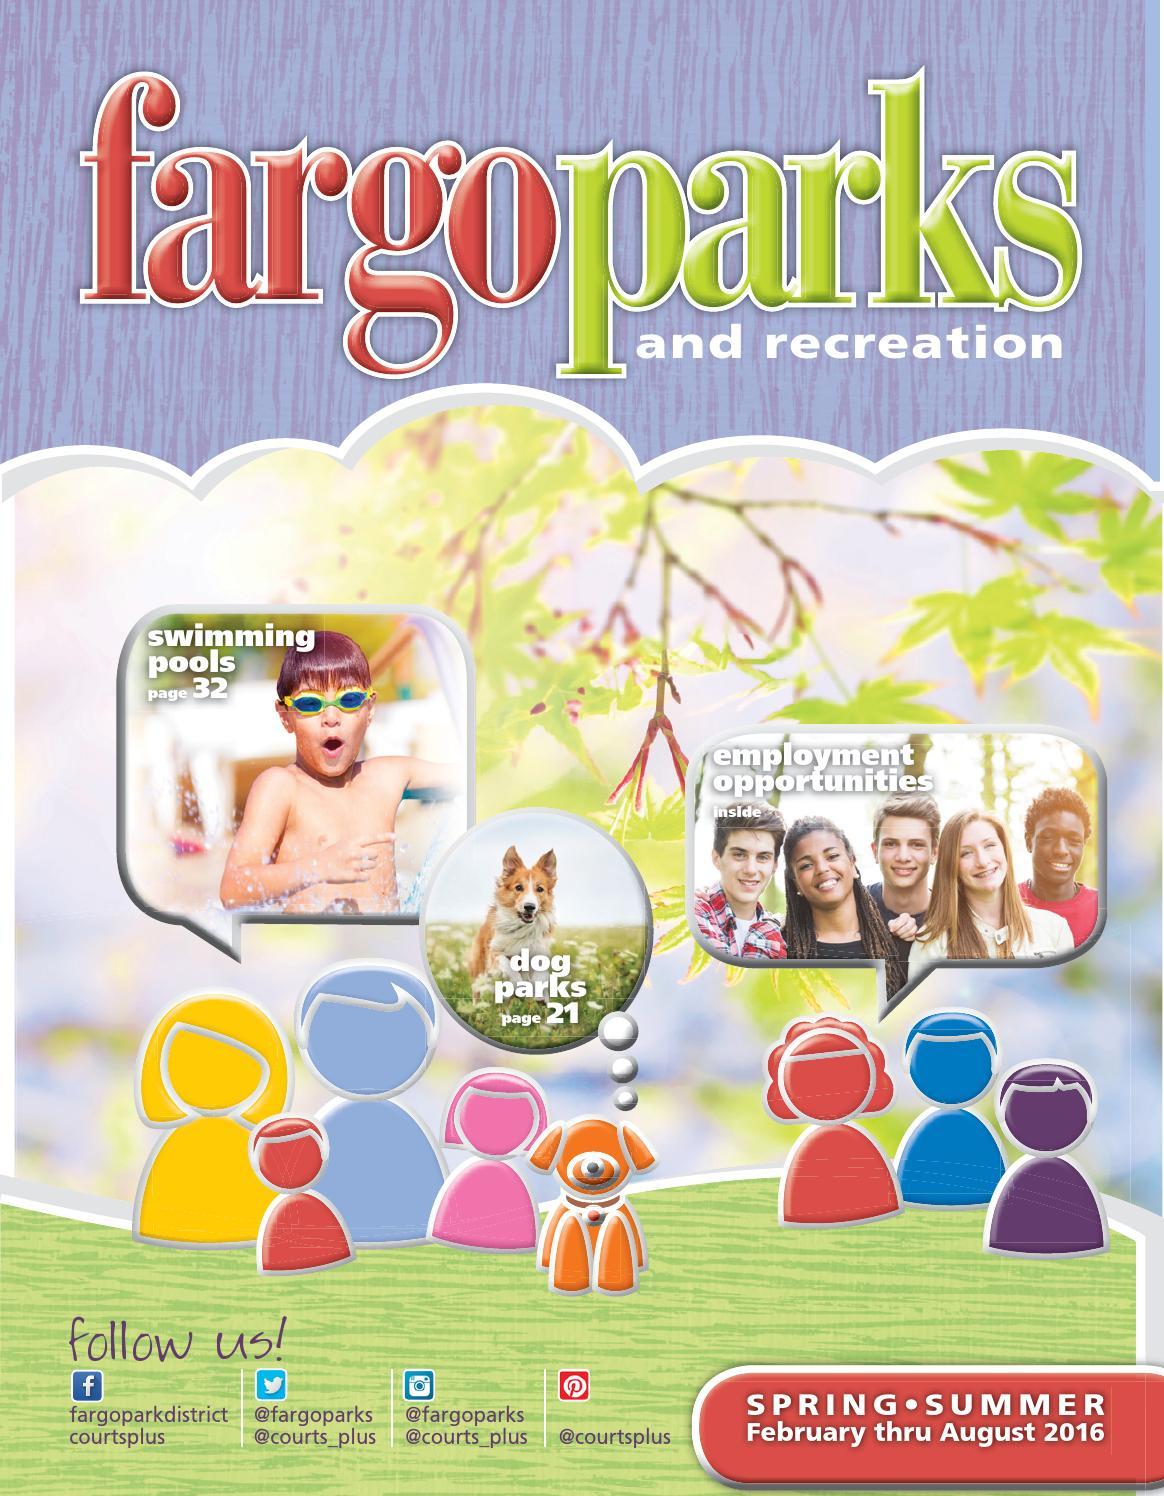 Fargo Parks Spring Summer 2016 By Fargoparks Issuu